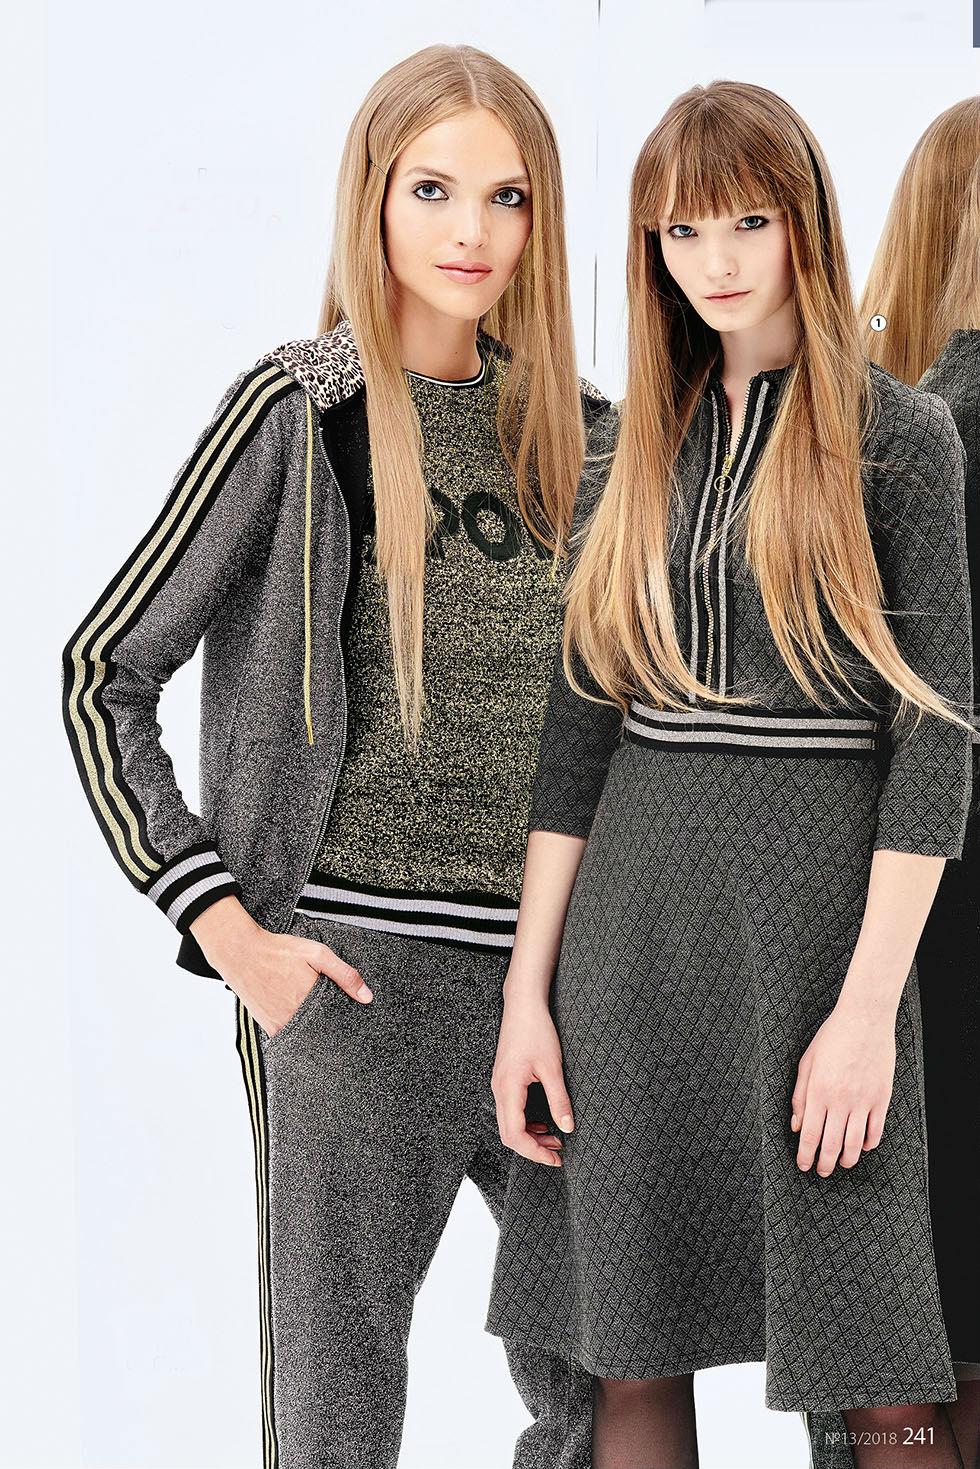 be5e5e0c89767 Одежда Фаберлик для женщин серия Глэм спорт | faberlic/фаберлик